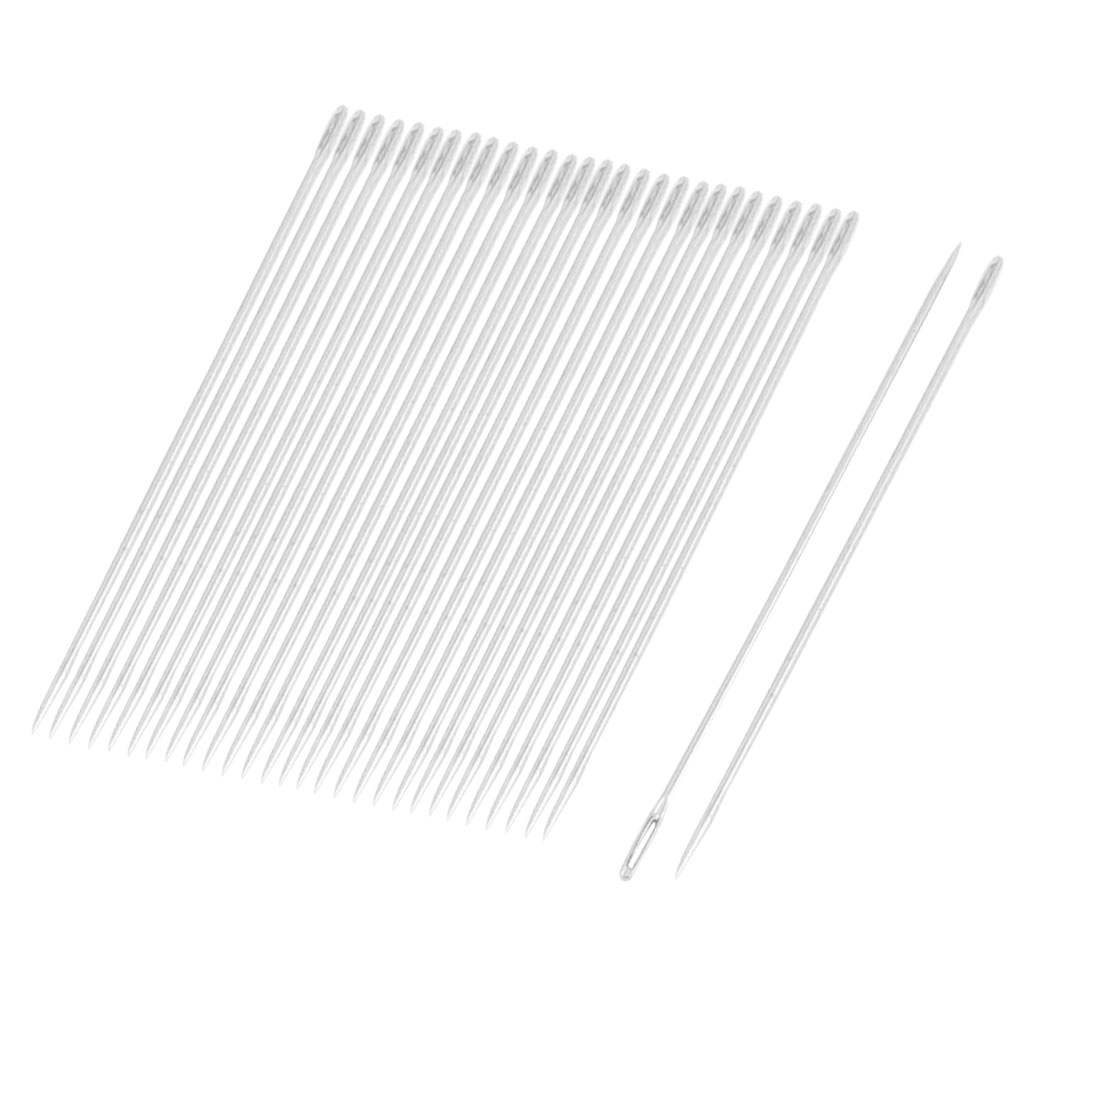 0.6mm Dia Sharp Tip Metal Quilting Tailoring Sewing Needles 30 Pcs